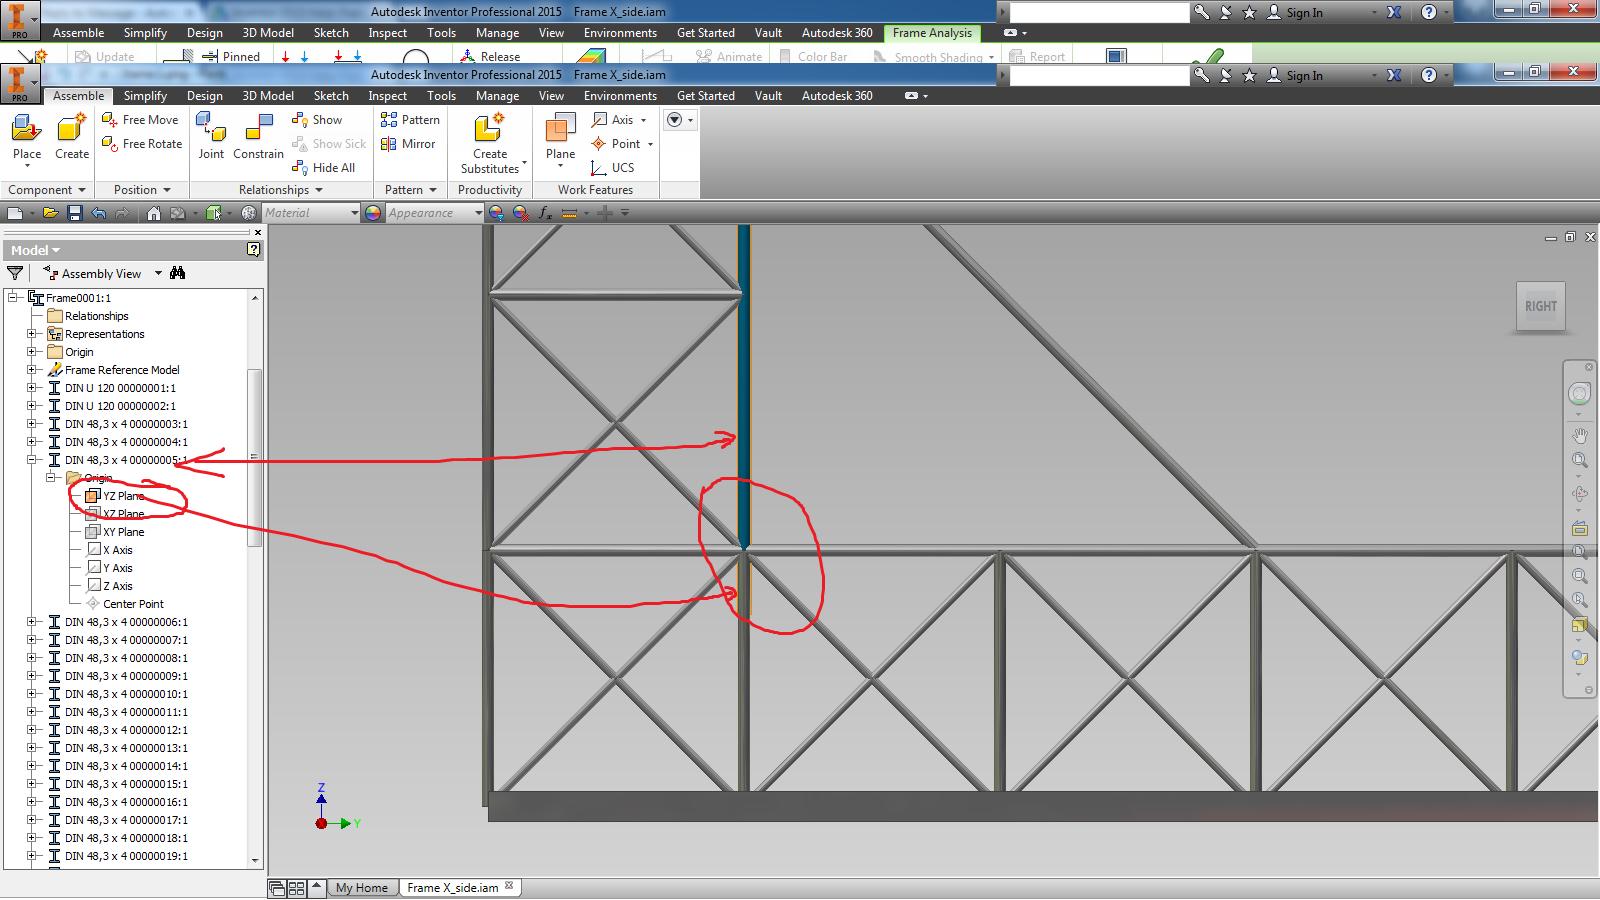 Frame analysis - expert help needed - Autodesk Community